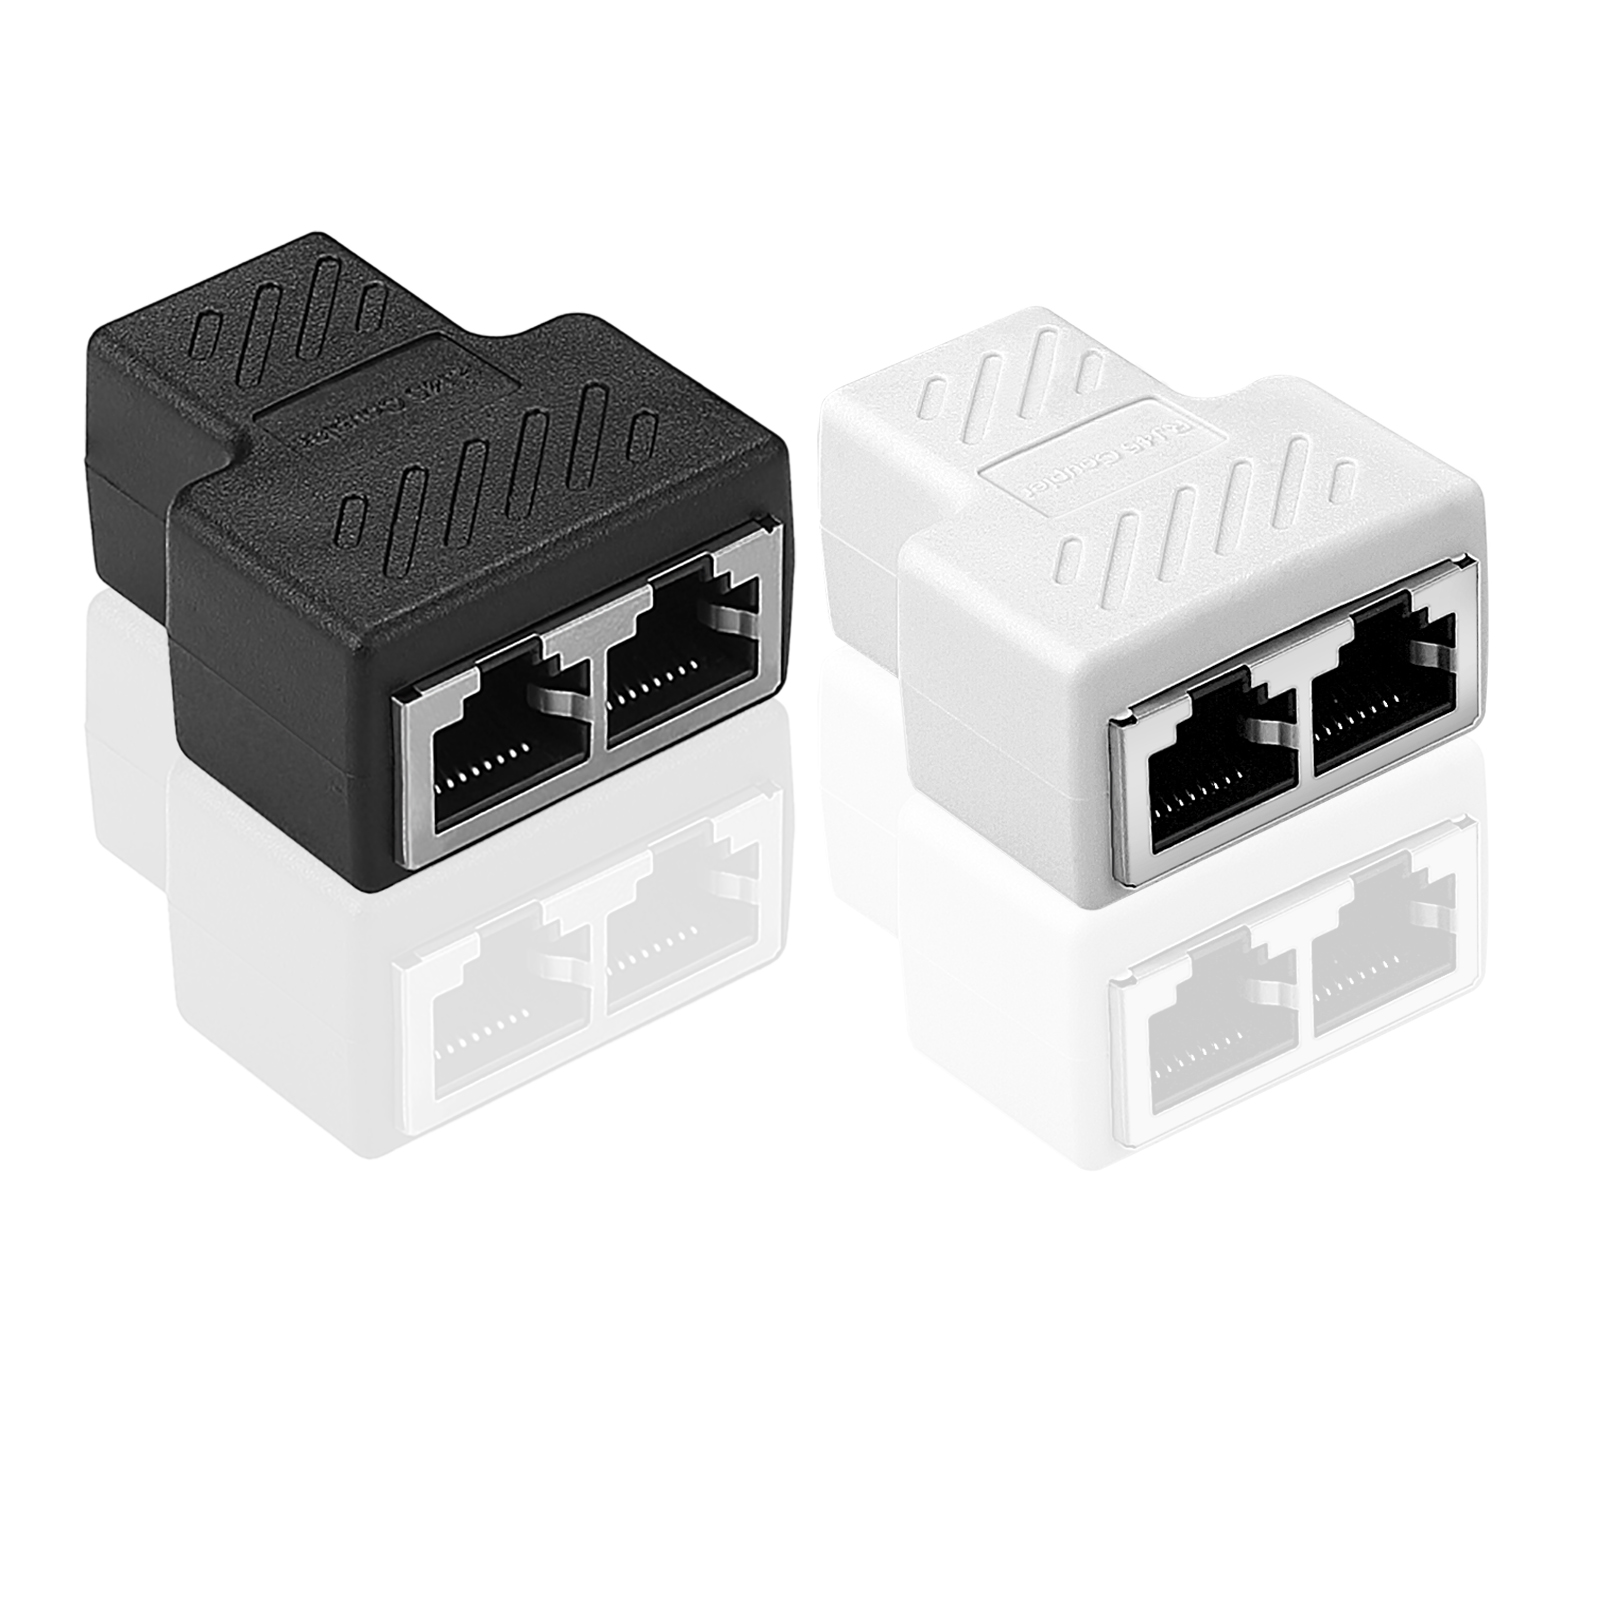 1 bis 2 lan ethernet netzwerk rj45 splitter extender stecker adapter stecker ebay. Black Bedroom Furniture Sets. Home Design Ideas